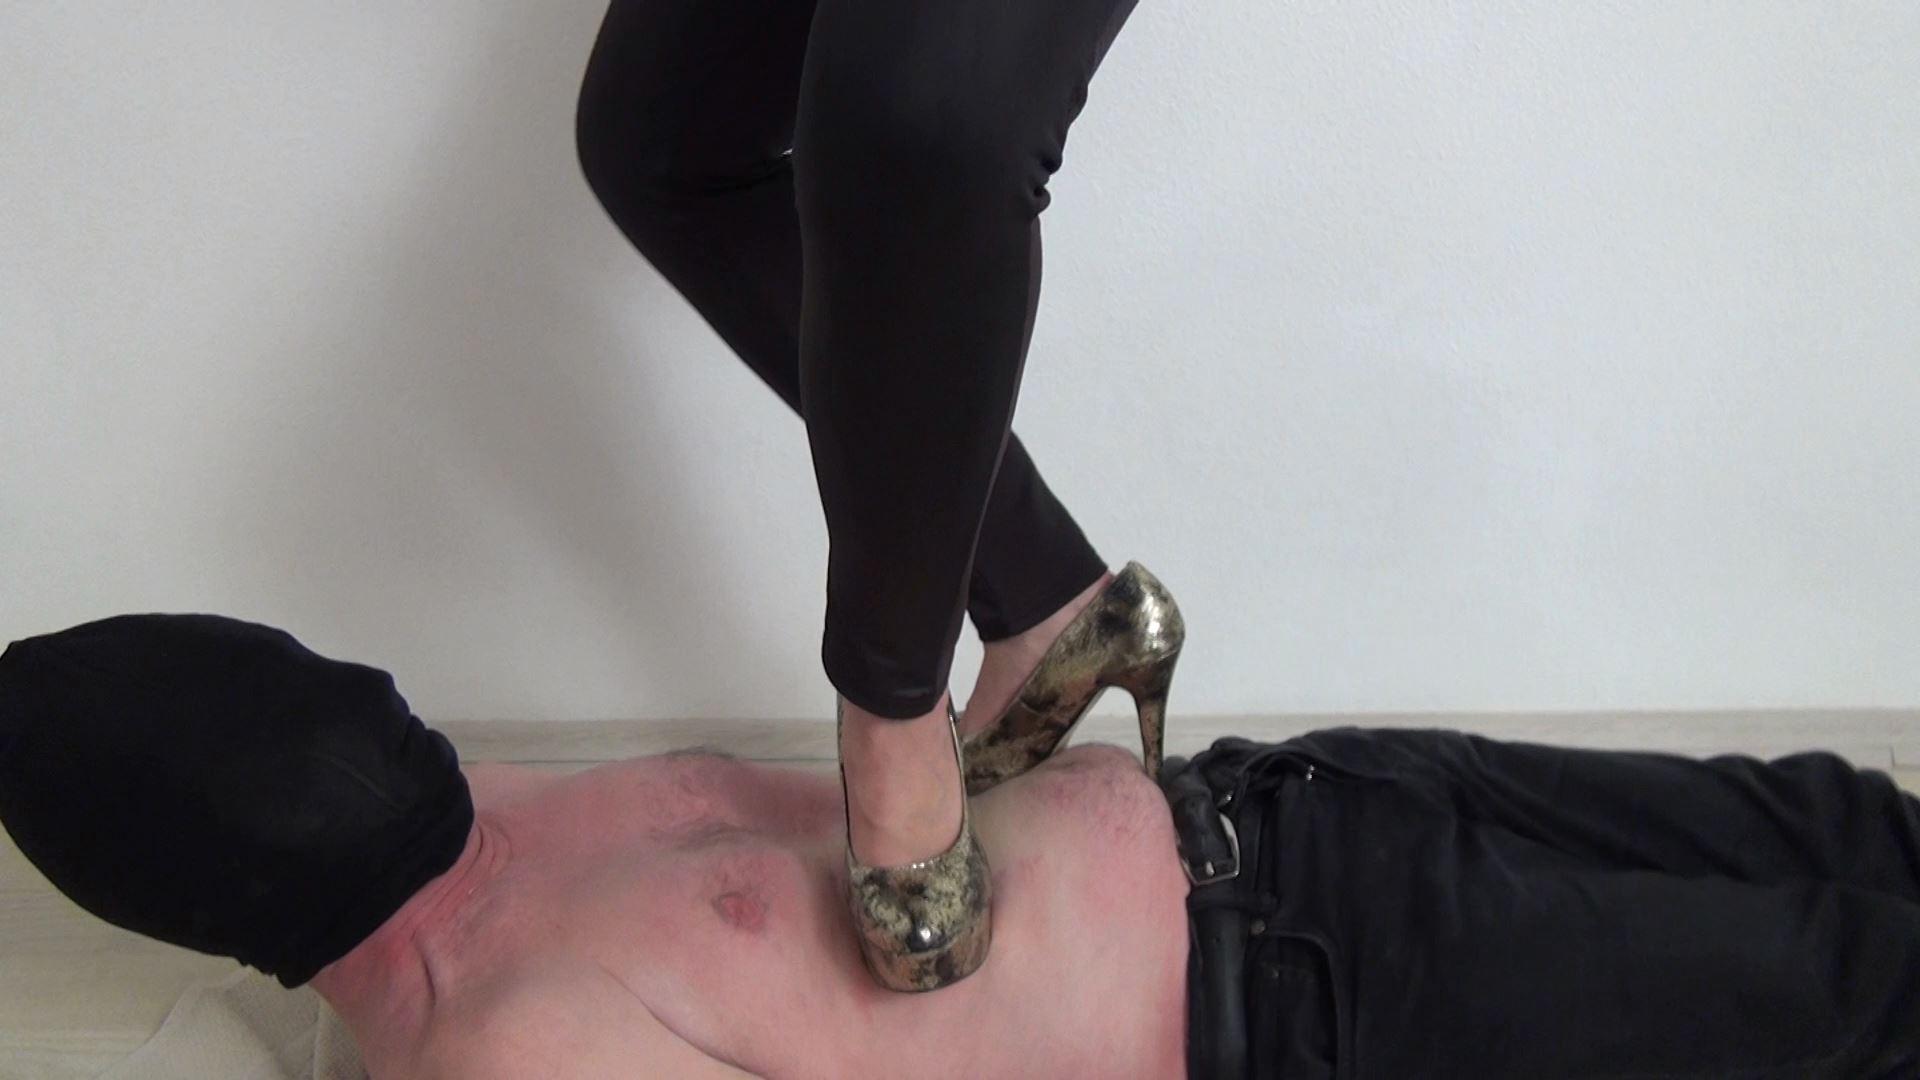 Mistress Maya In Scene: Trampling in Extreme High Heels - ABBIECATFETISH - FULL HD/1080p/MP4